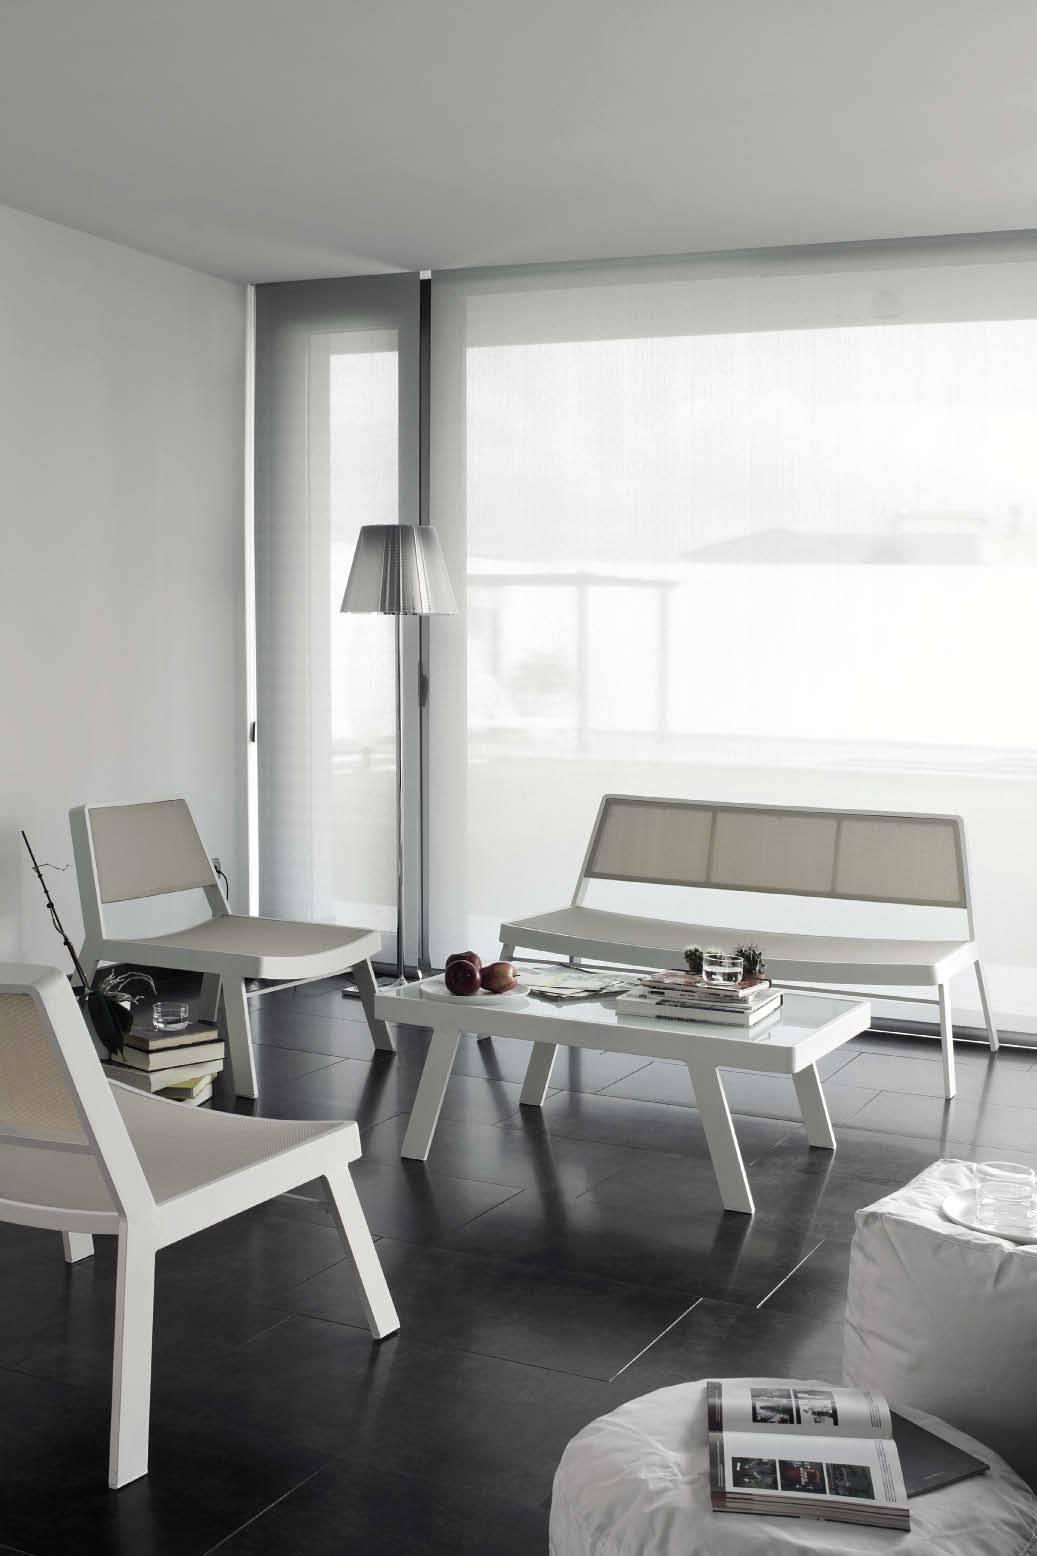 Fauteuil et table basse de jardin en aluminium design ...